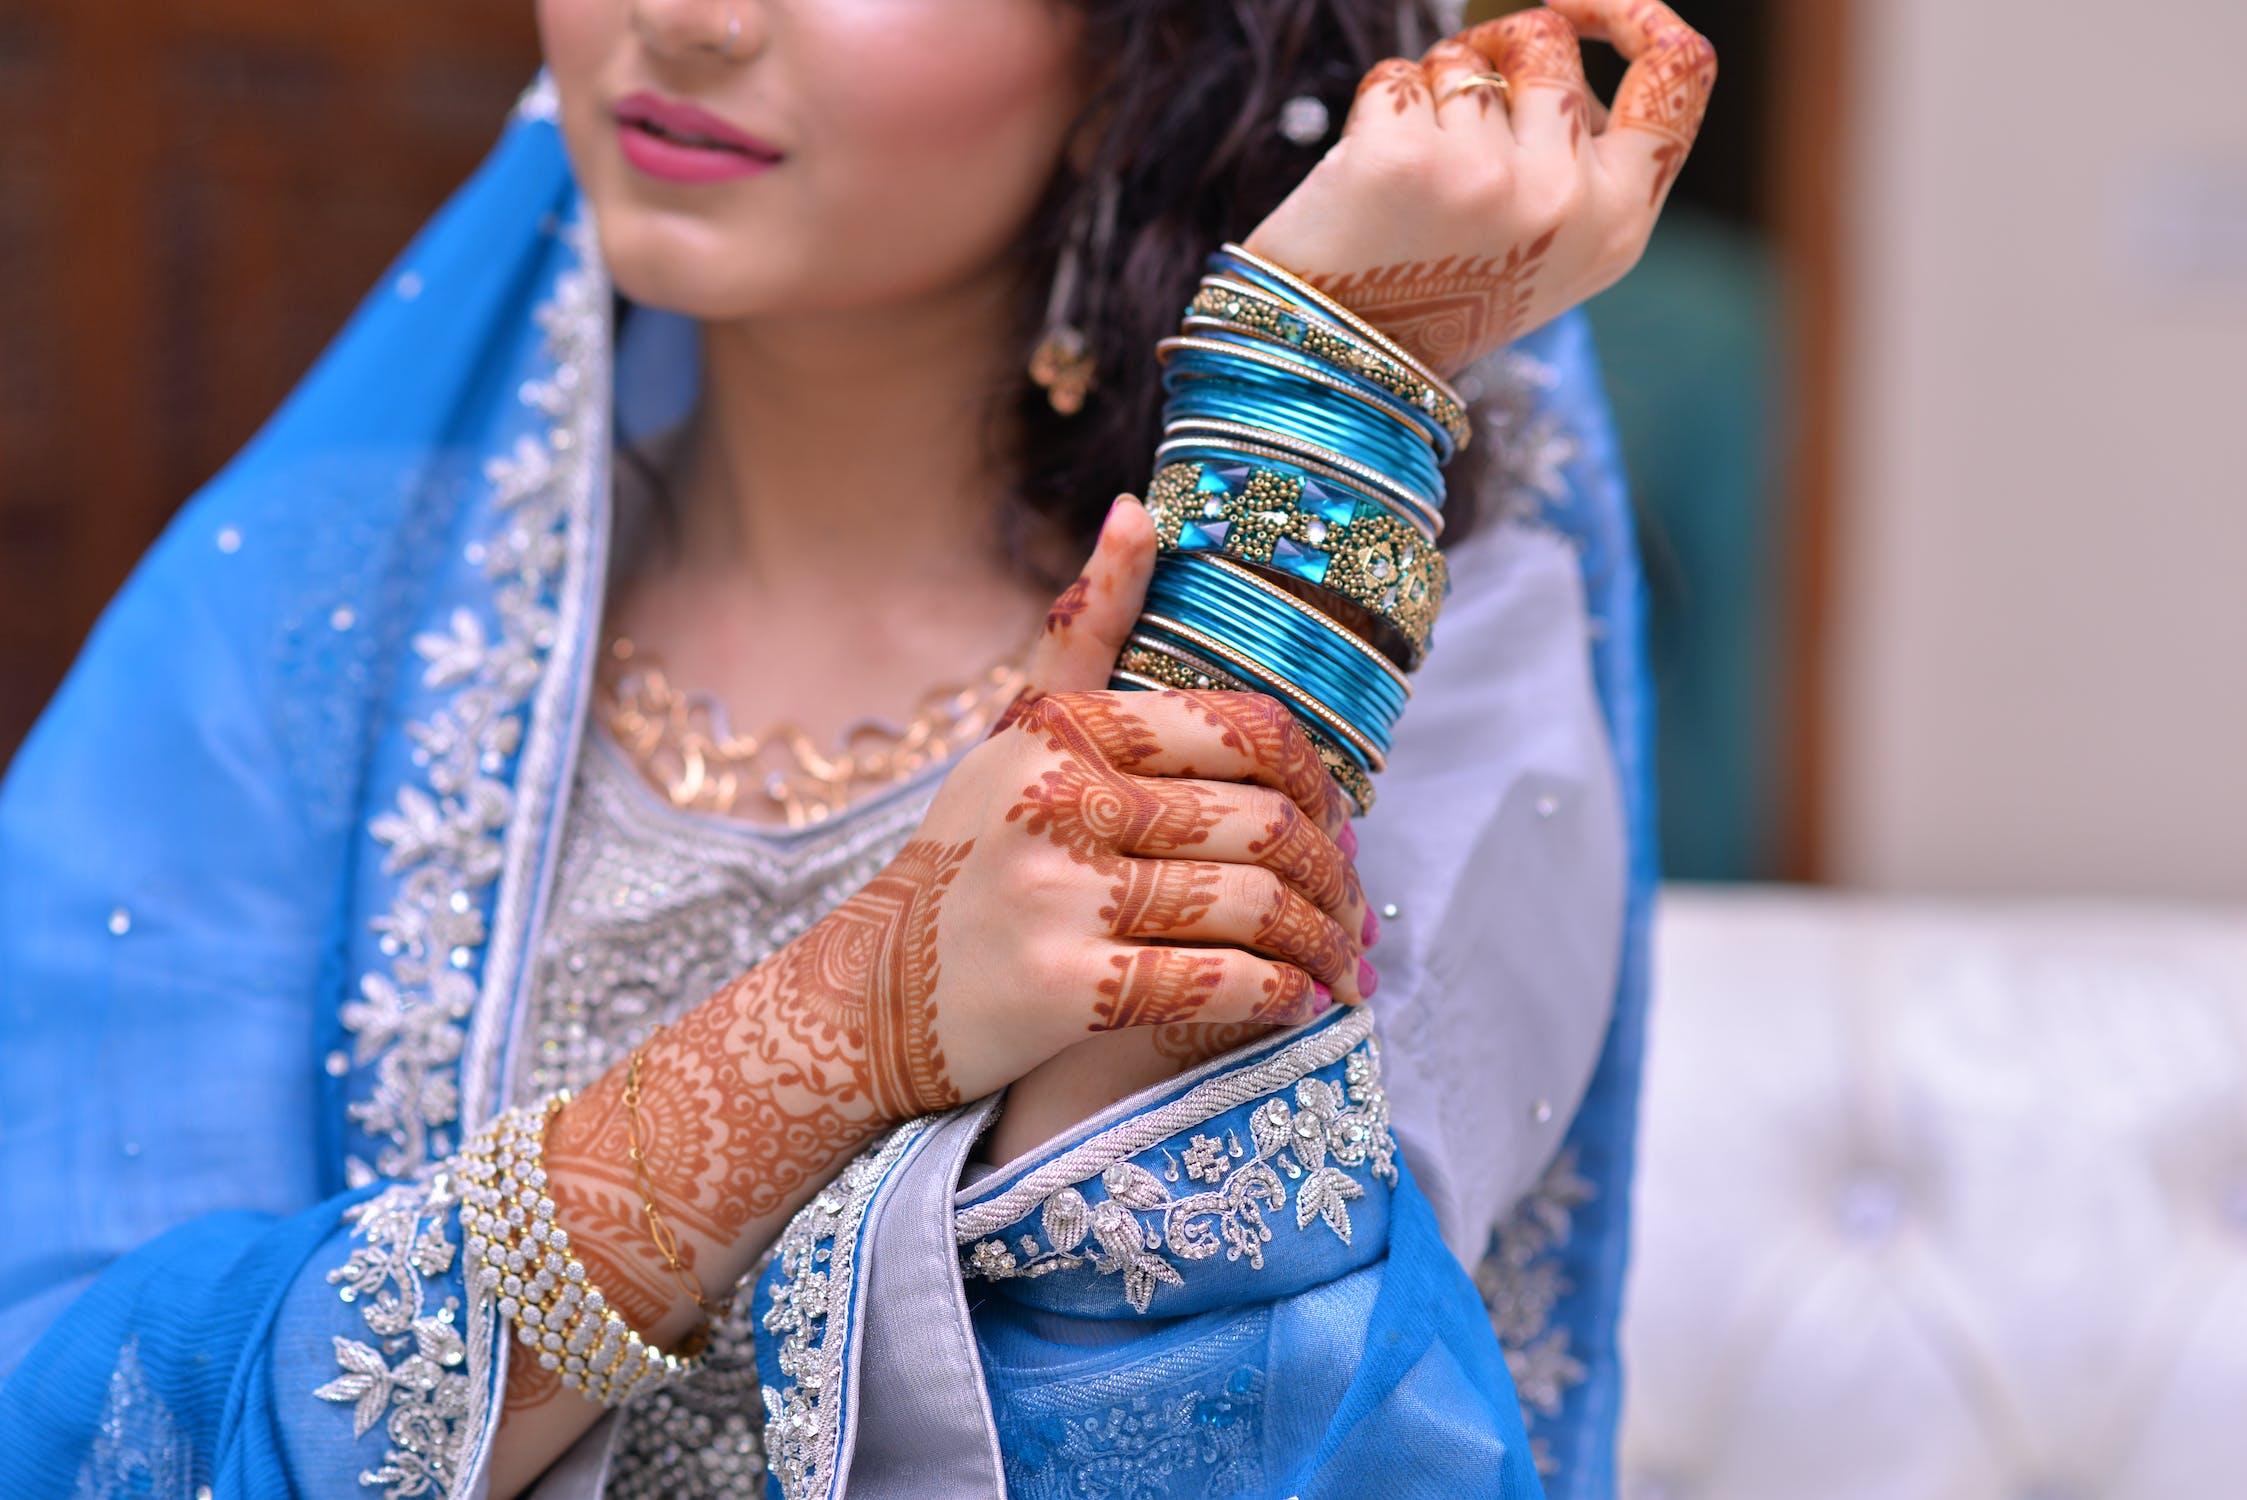 Indian Girl Photo by Qazi Ikram Ul Haq from Pexels